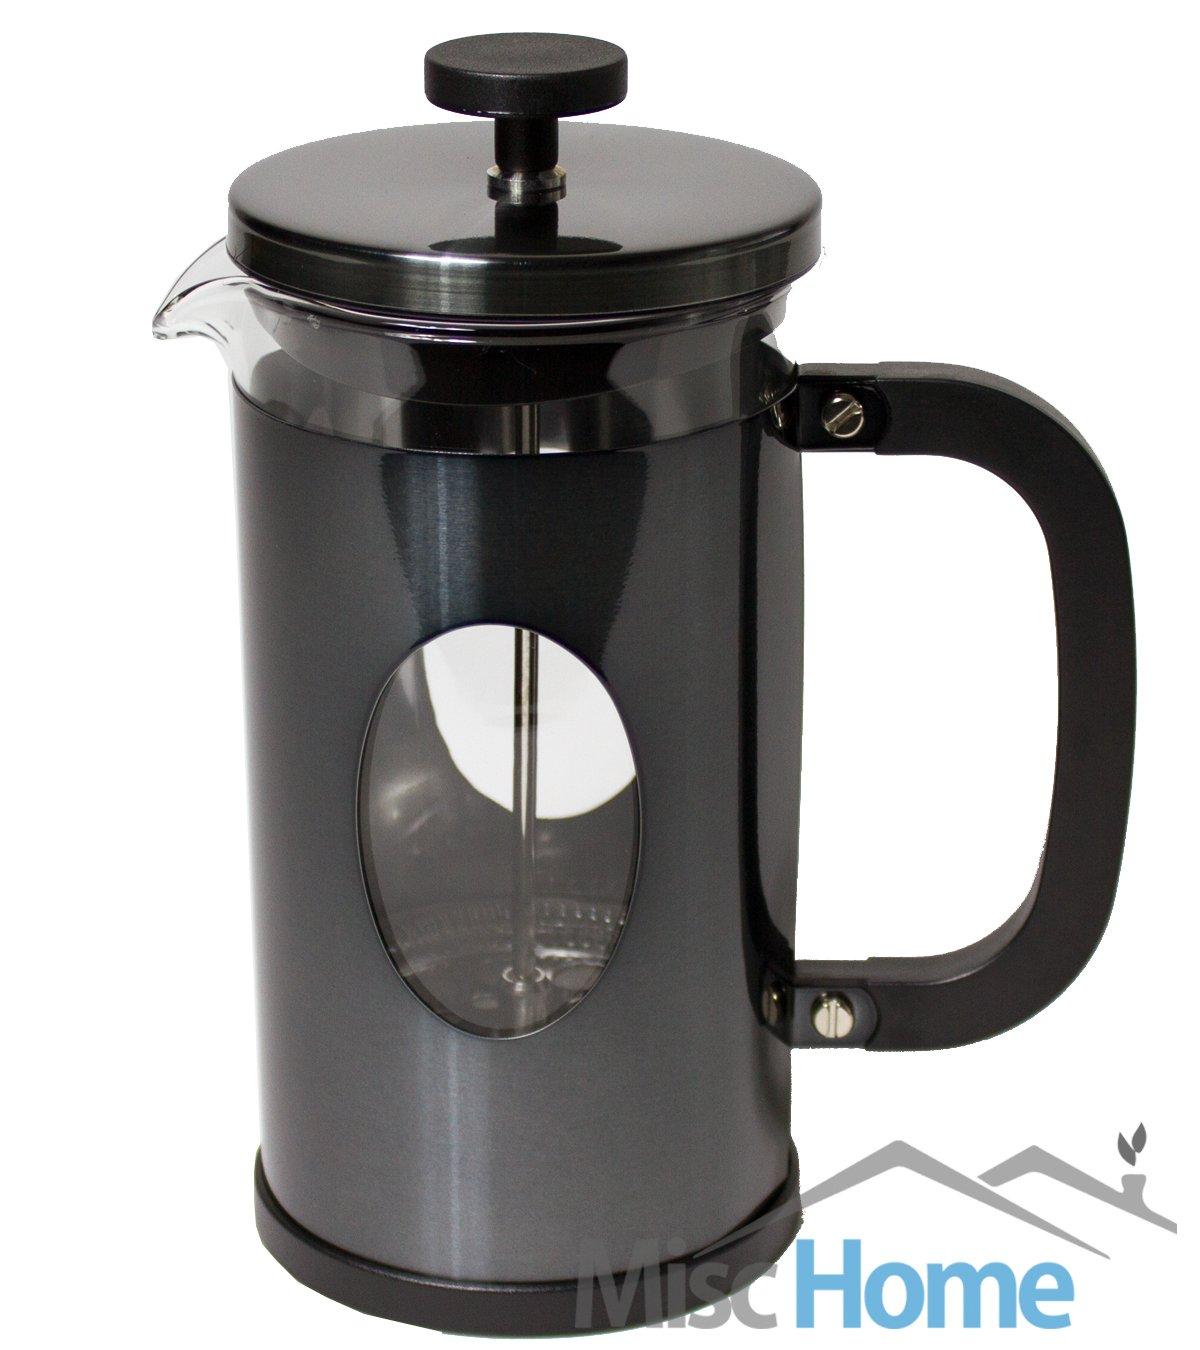 Misc Home Gourmet Gunmetal Finish Stainless Steel French Press Coffee Maker Tea Maker 1 Liter, 34 Oz Coffee Press Gunmetal